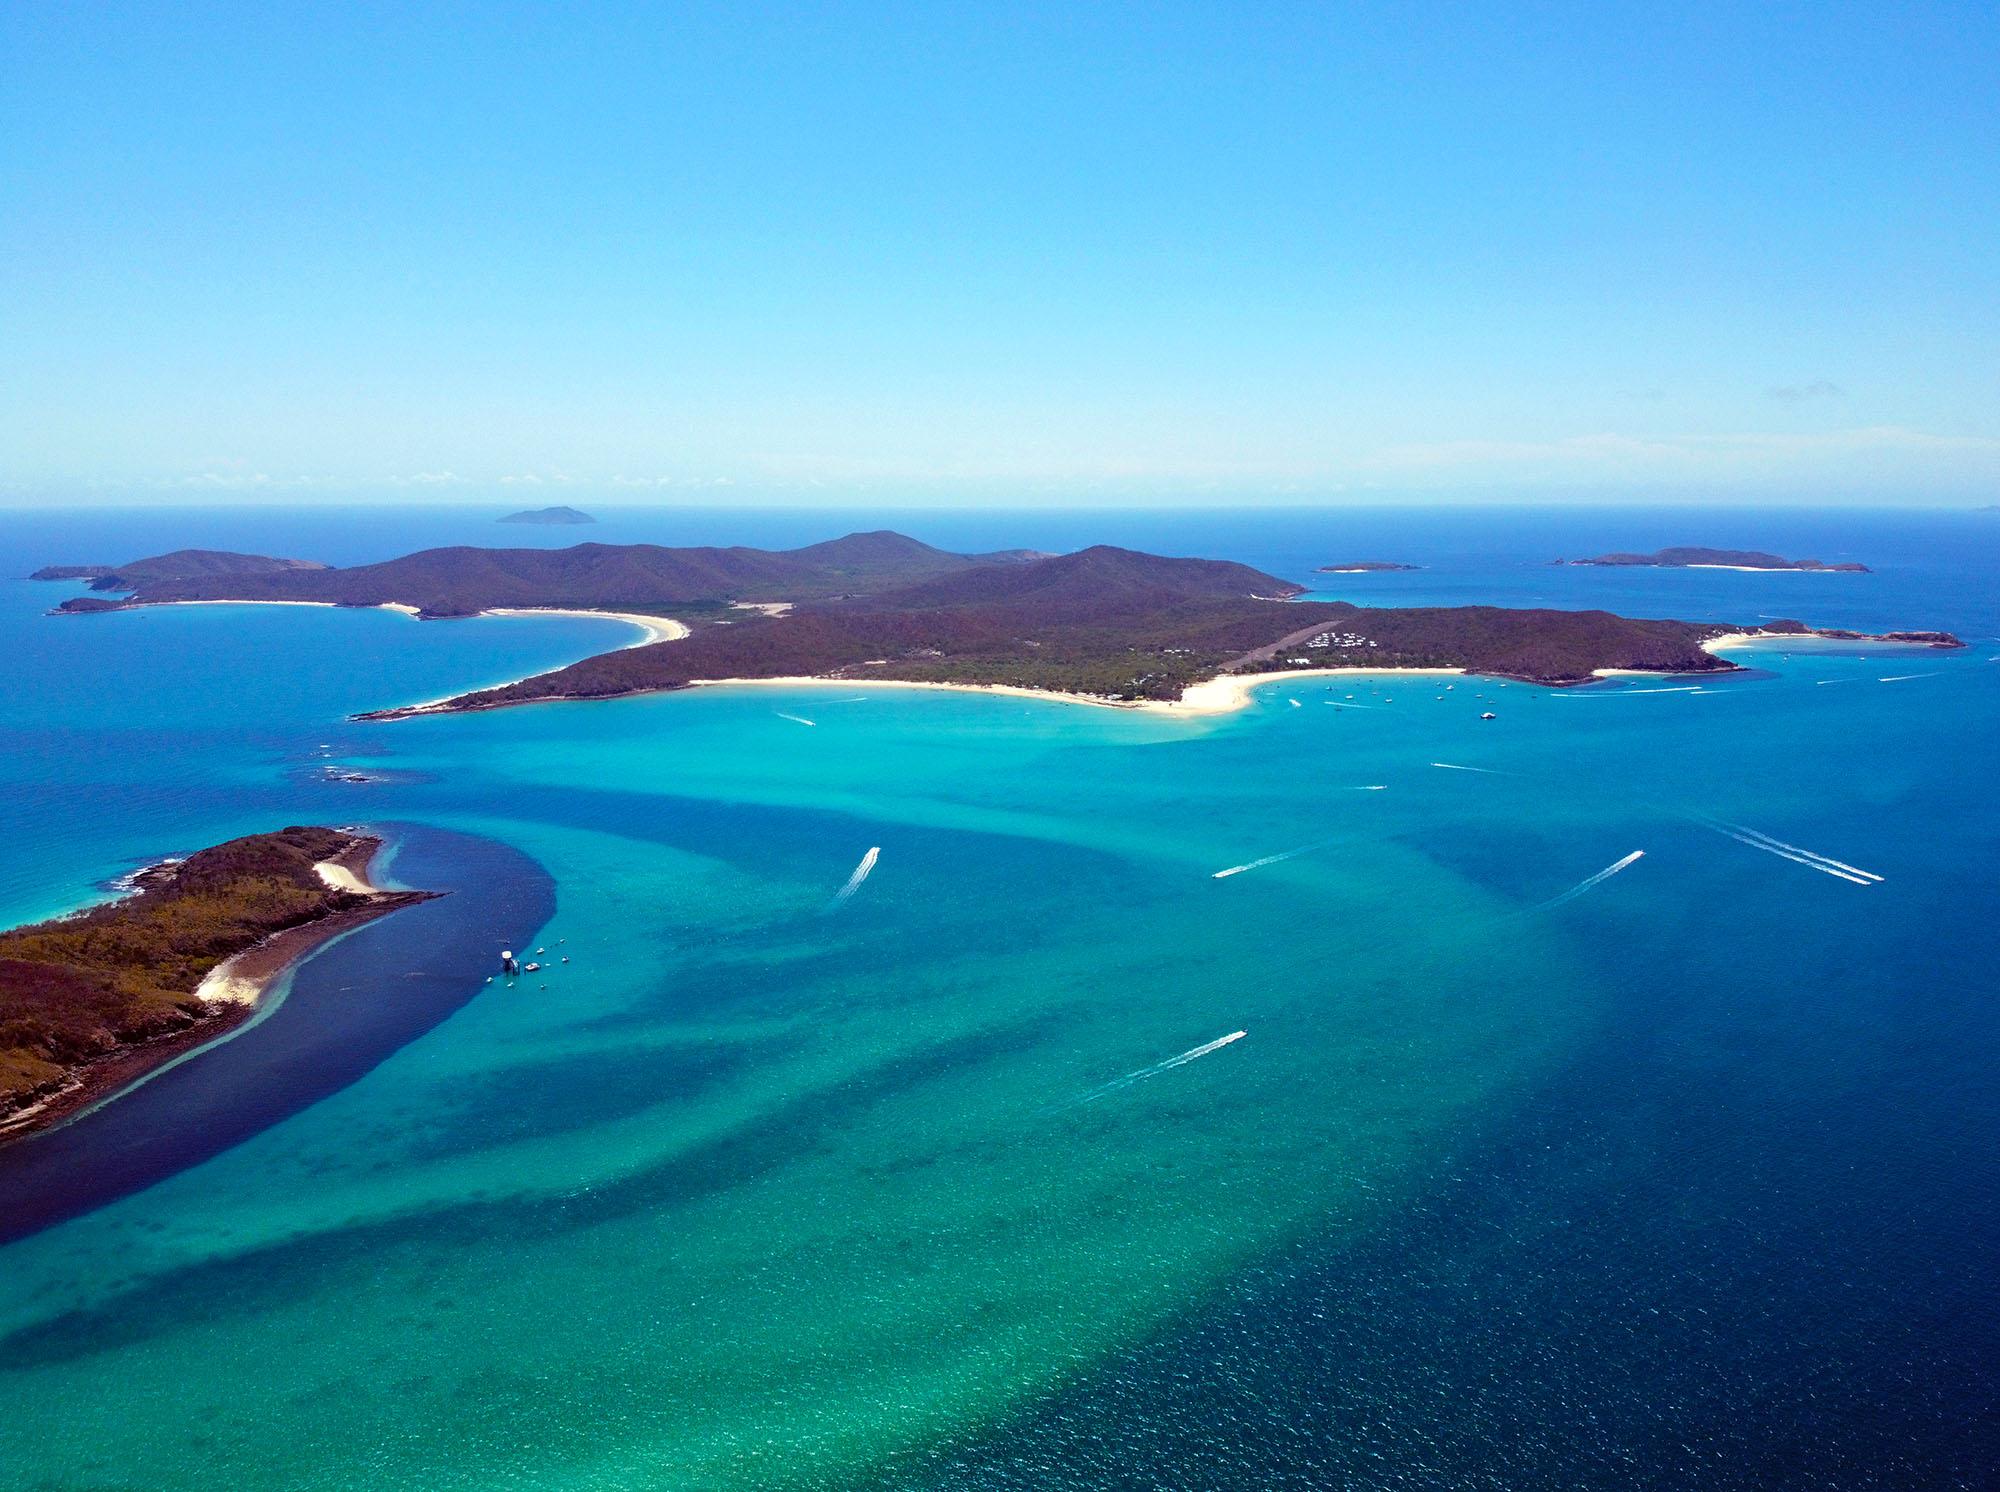 Photo of GKI & Middle Island